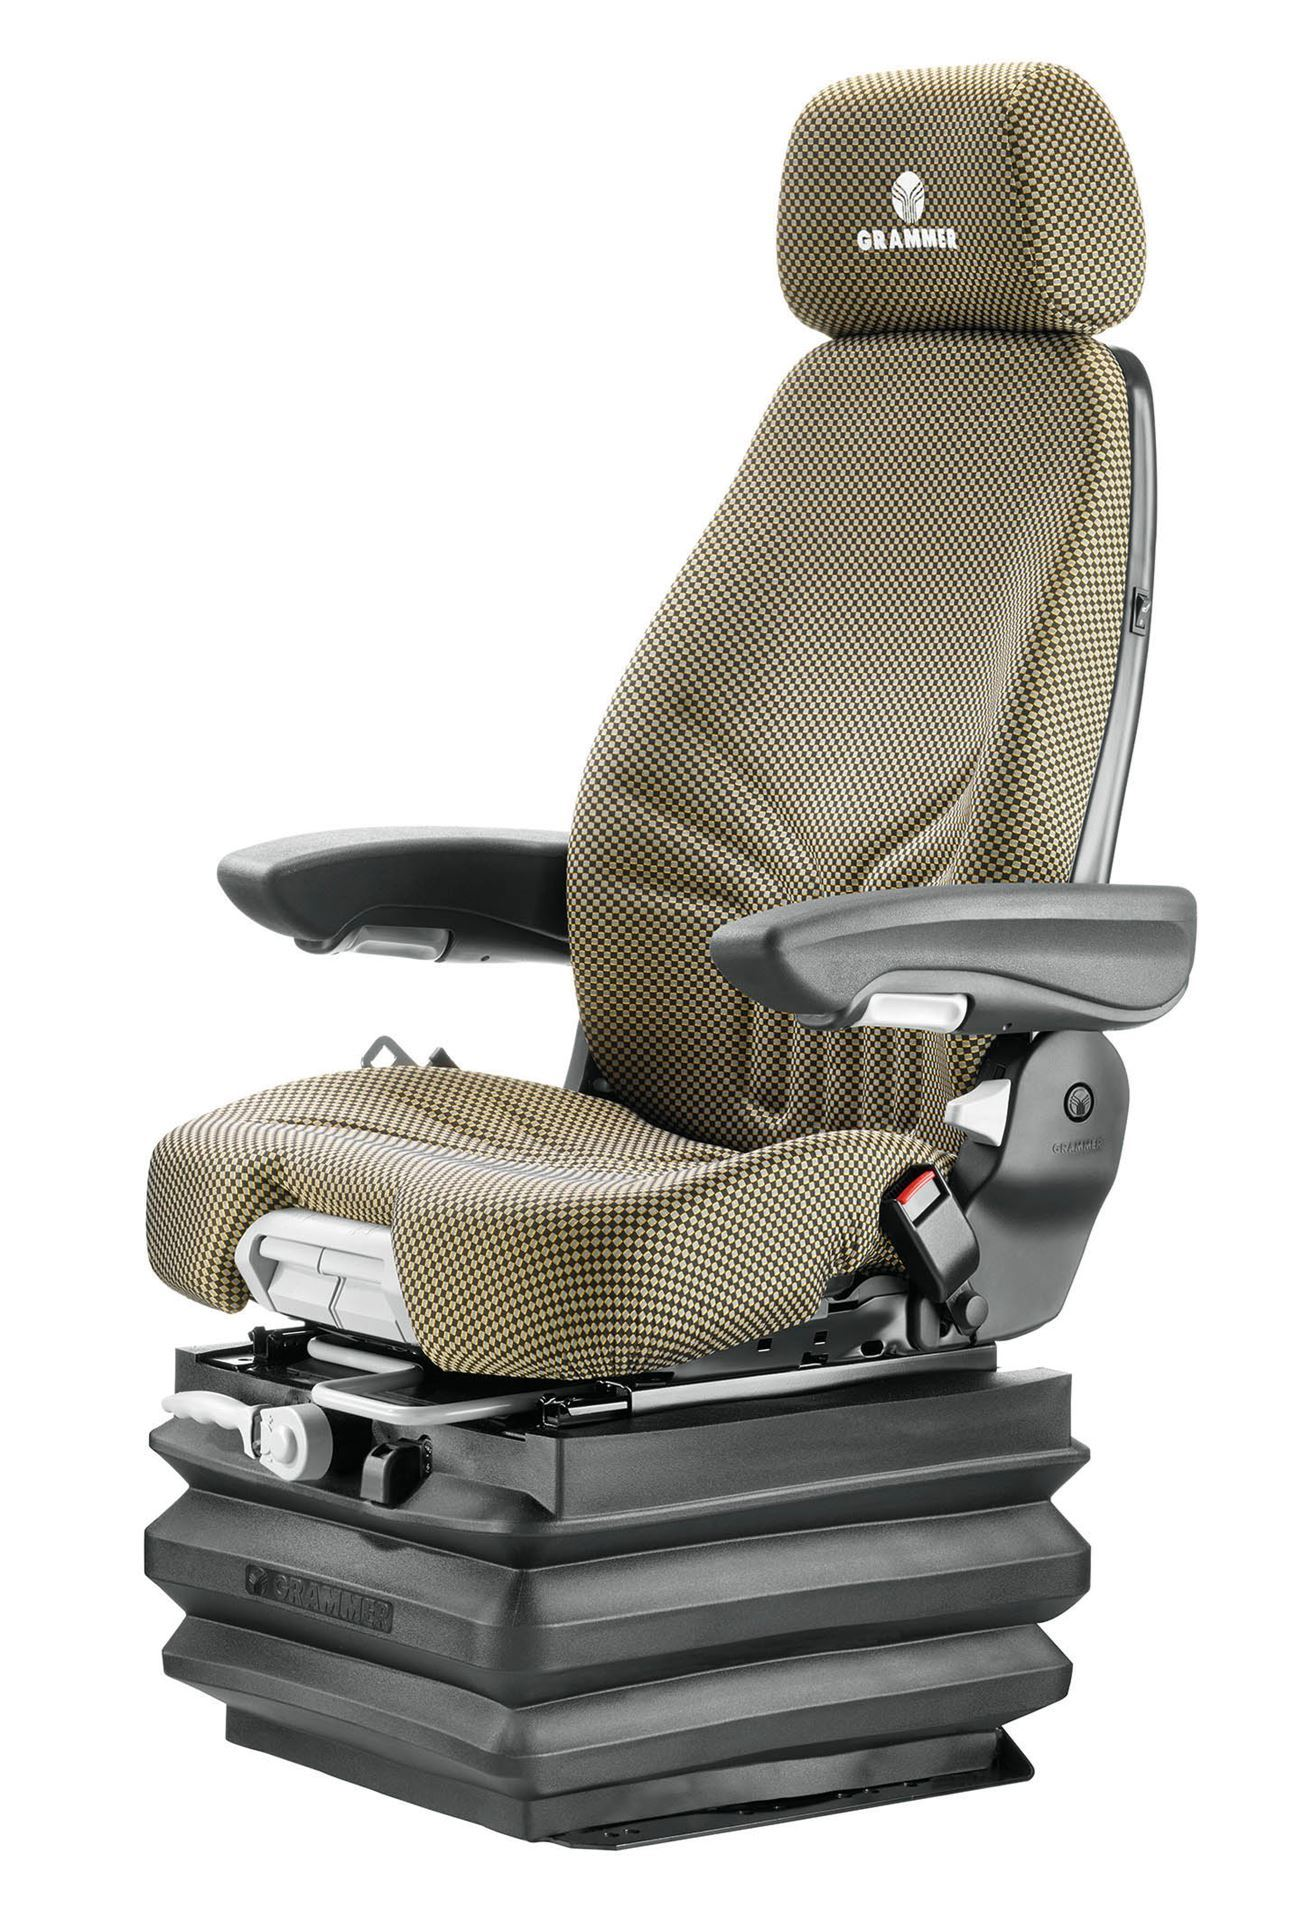 Grammer Actimo XXM Seat. Grammer Seating UK